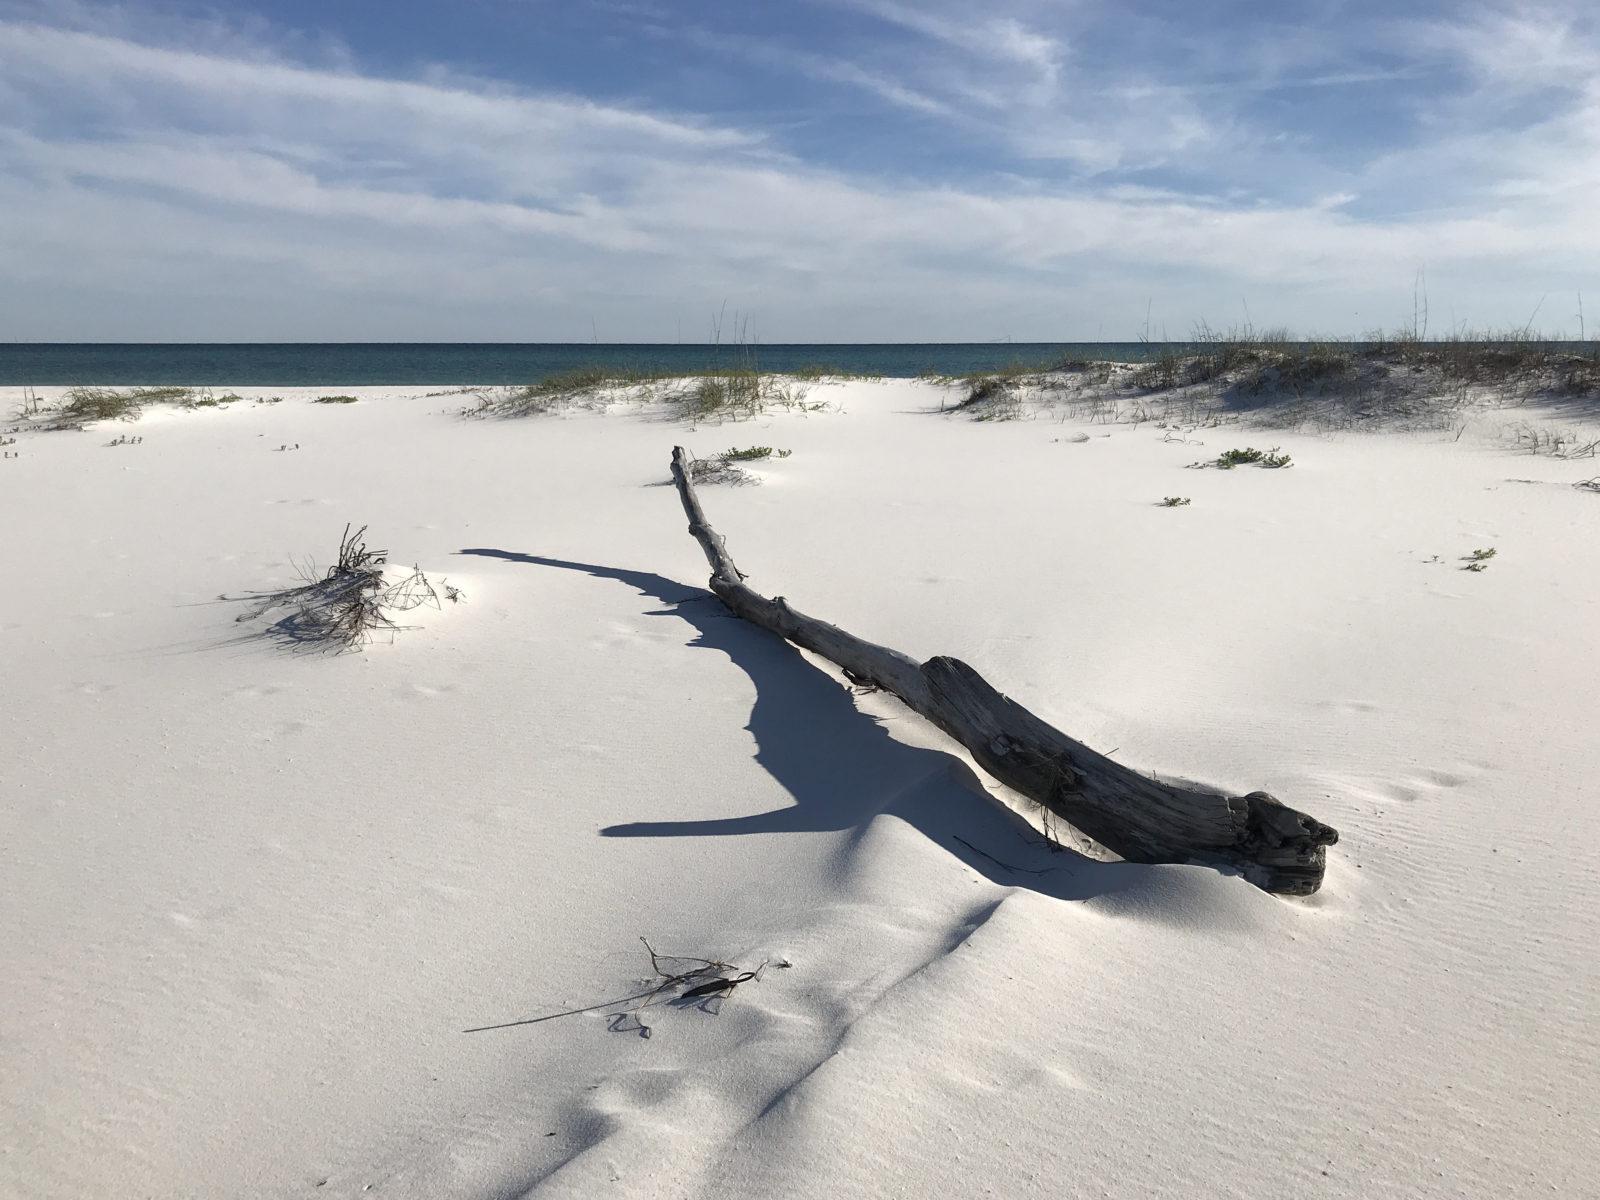 Florida Panhandle Part II: Gulf Islands National Seashore